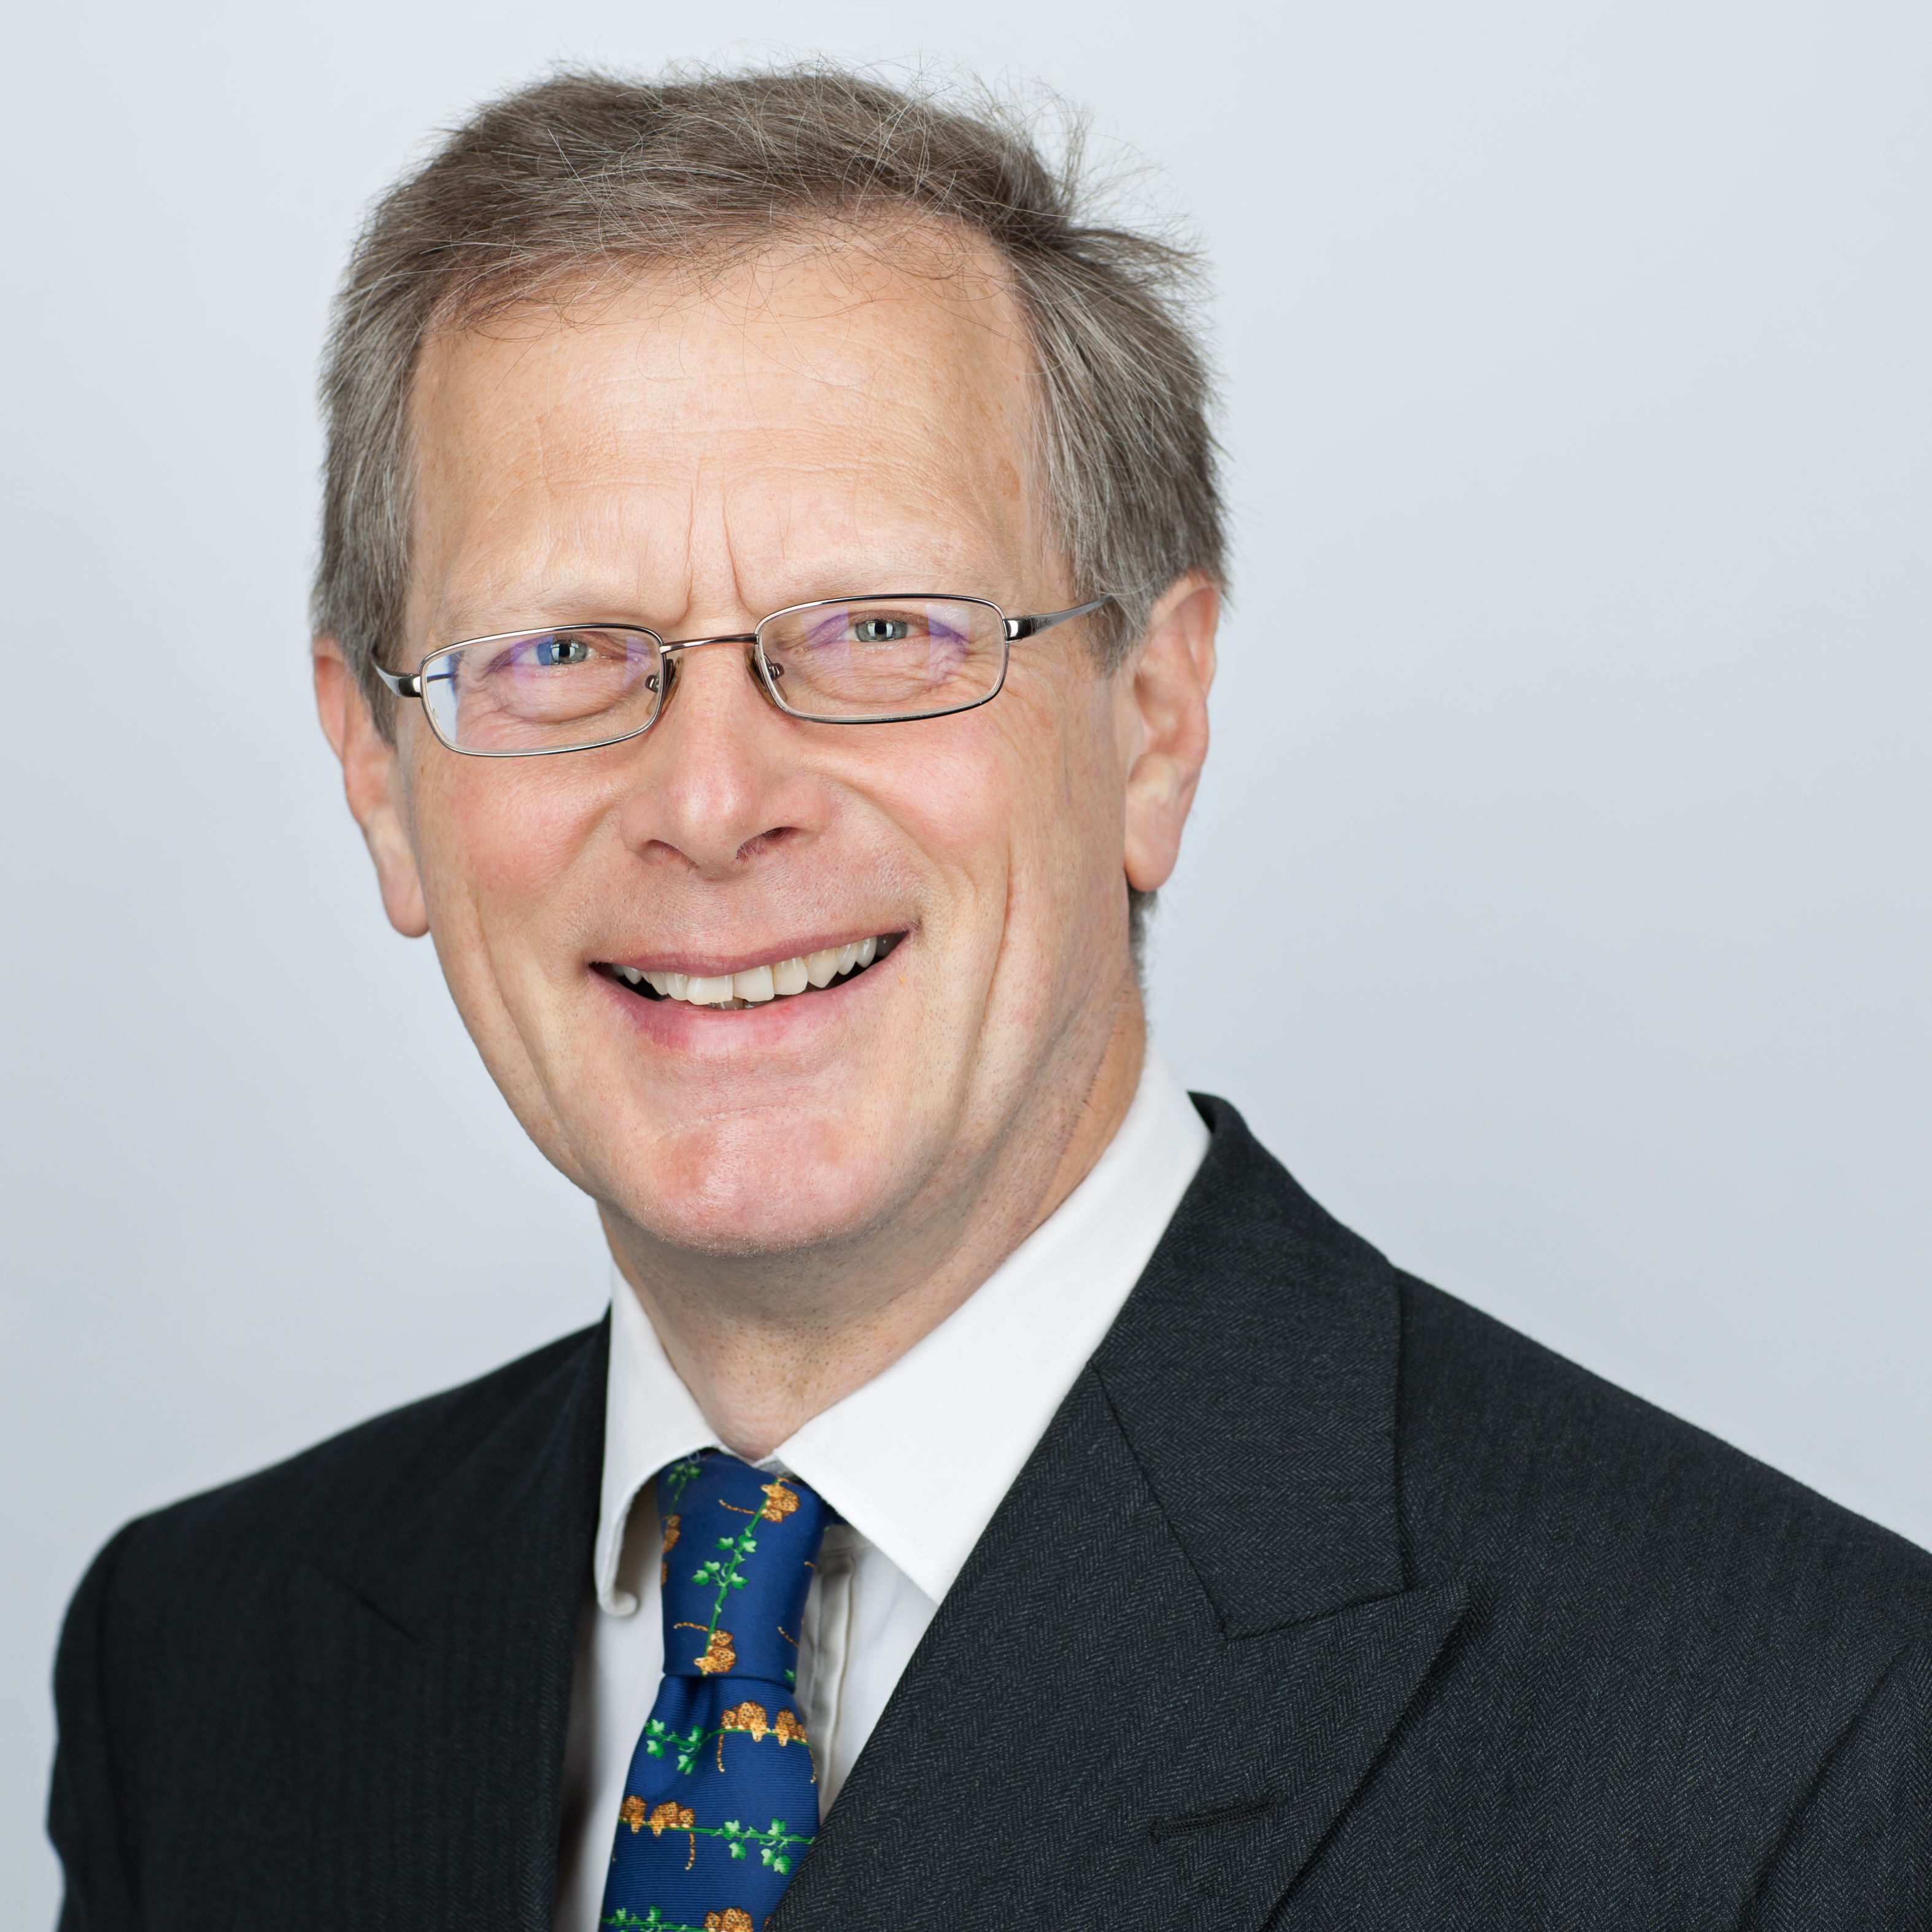 James Lockyer,, Board Committee Member at Midland Heart